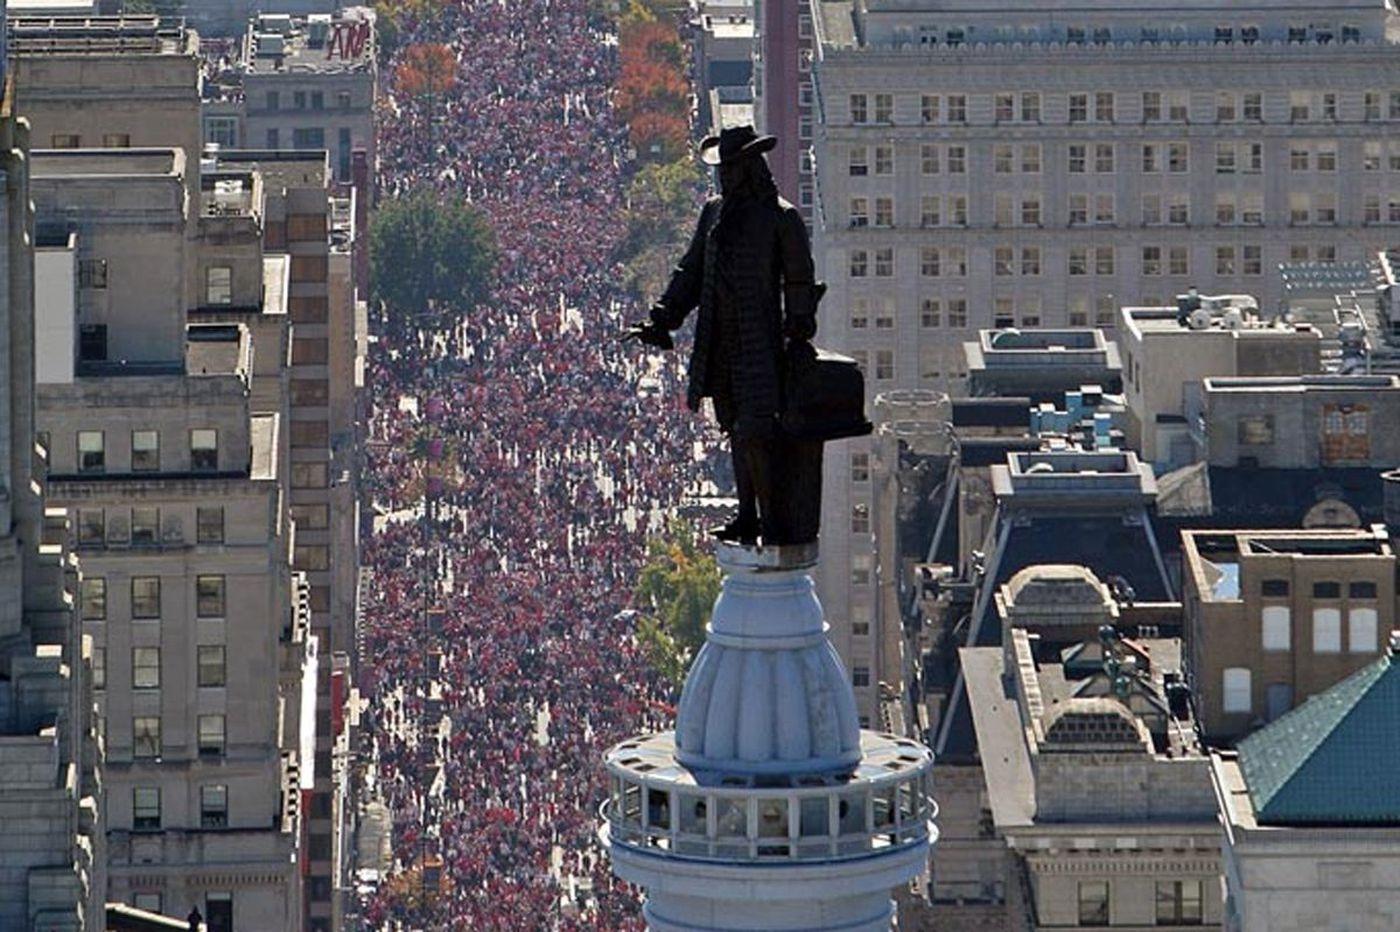 Eagles Super Bowl parade: Likely Thursday, Philadelphia mayor says